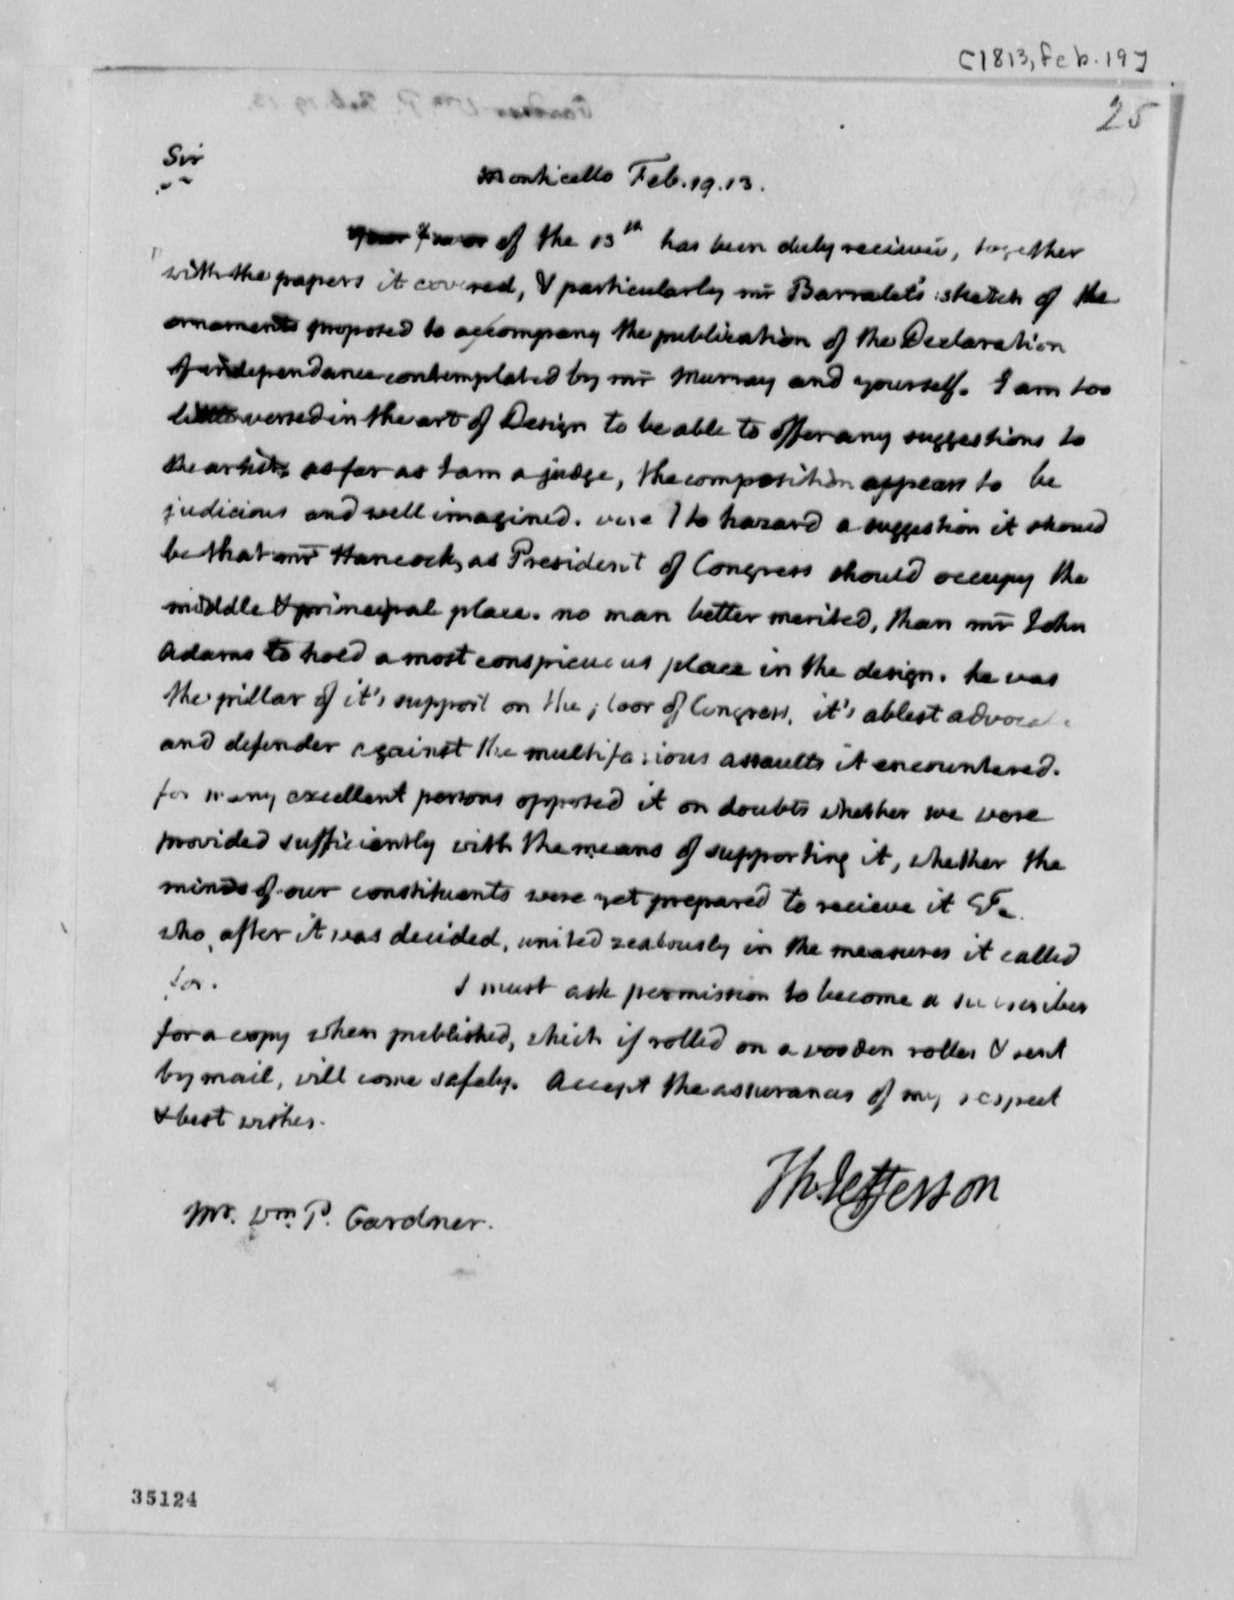 Thomas Jefferson to William P. Gardner, February 19, 1813